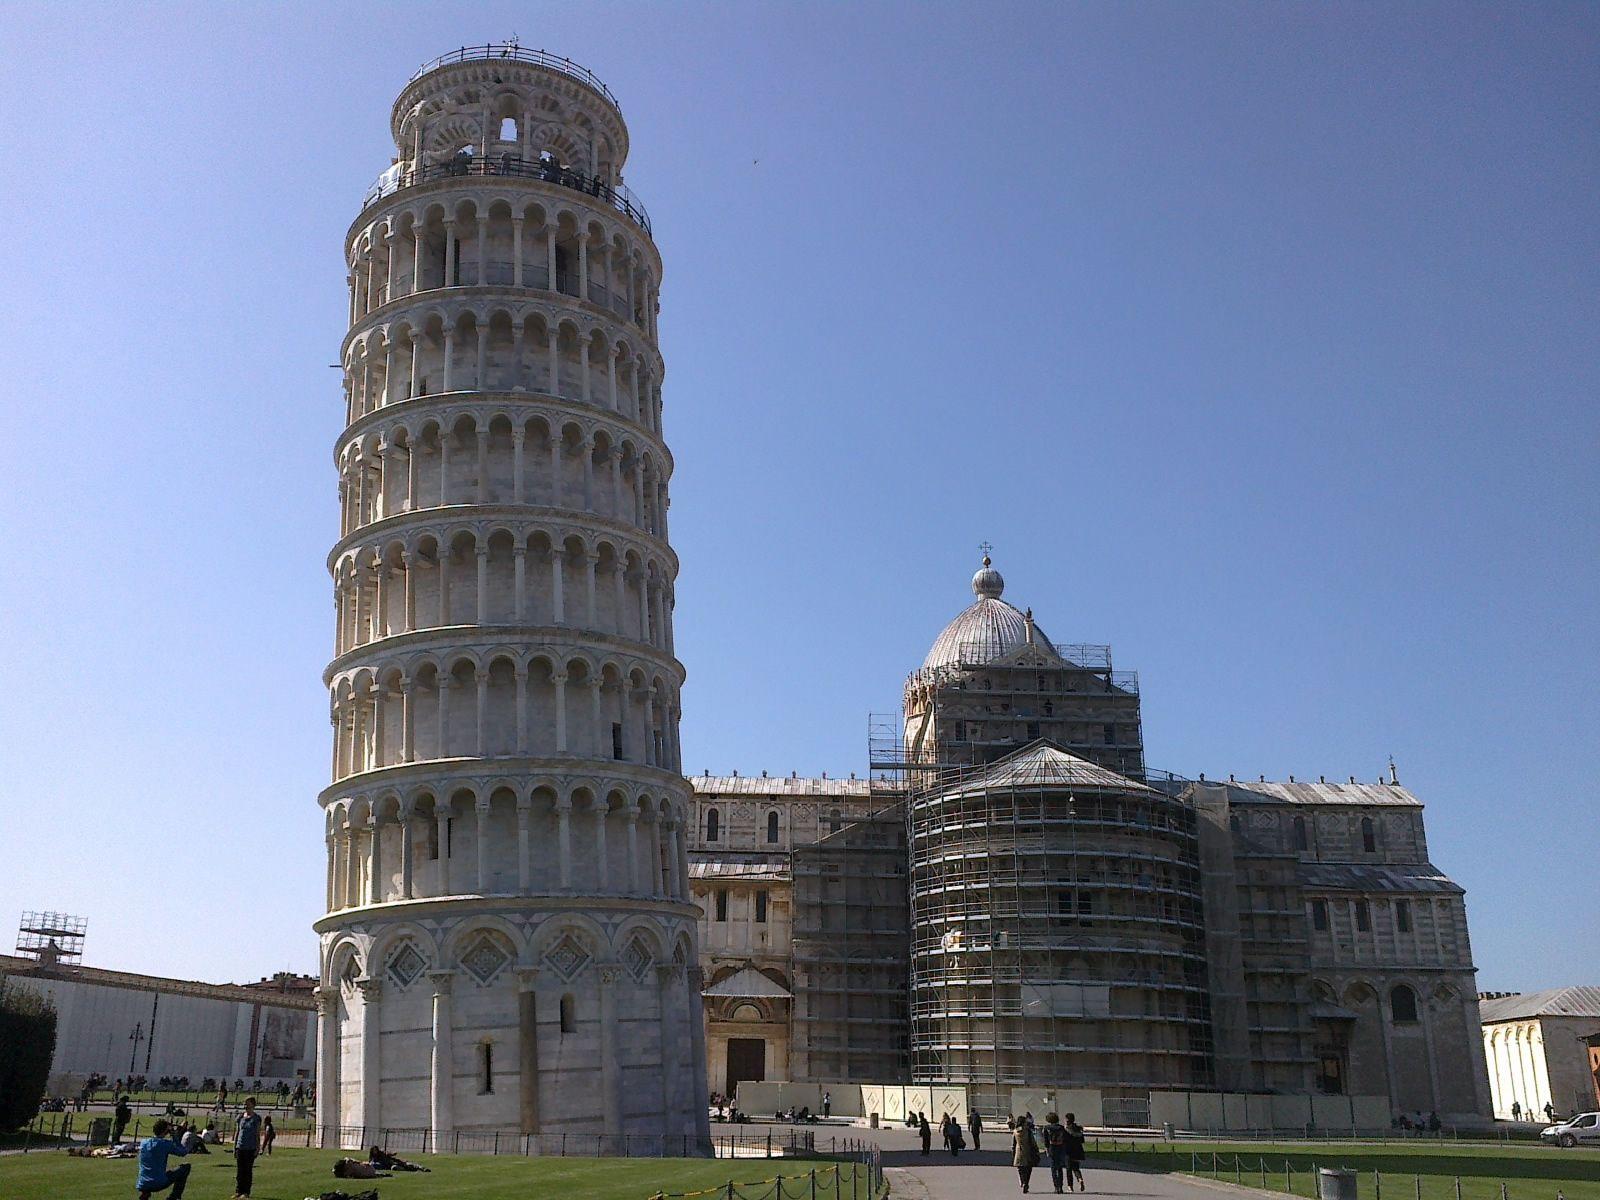 Mi sembra torre di Pisa  girando girando  Pinterest